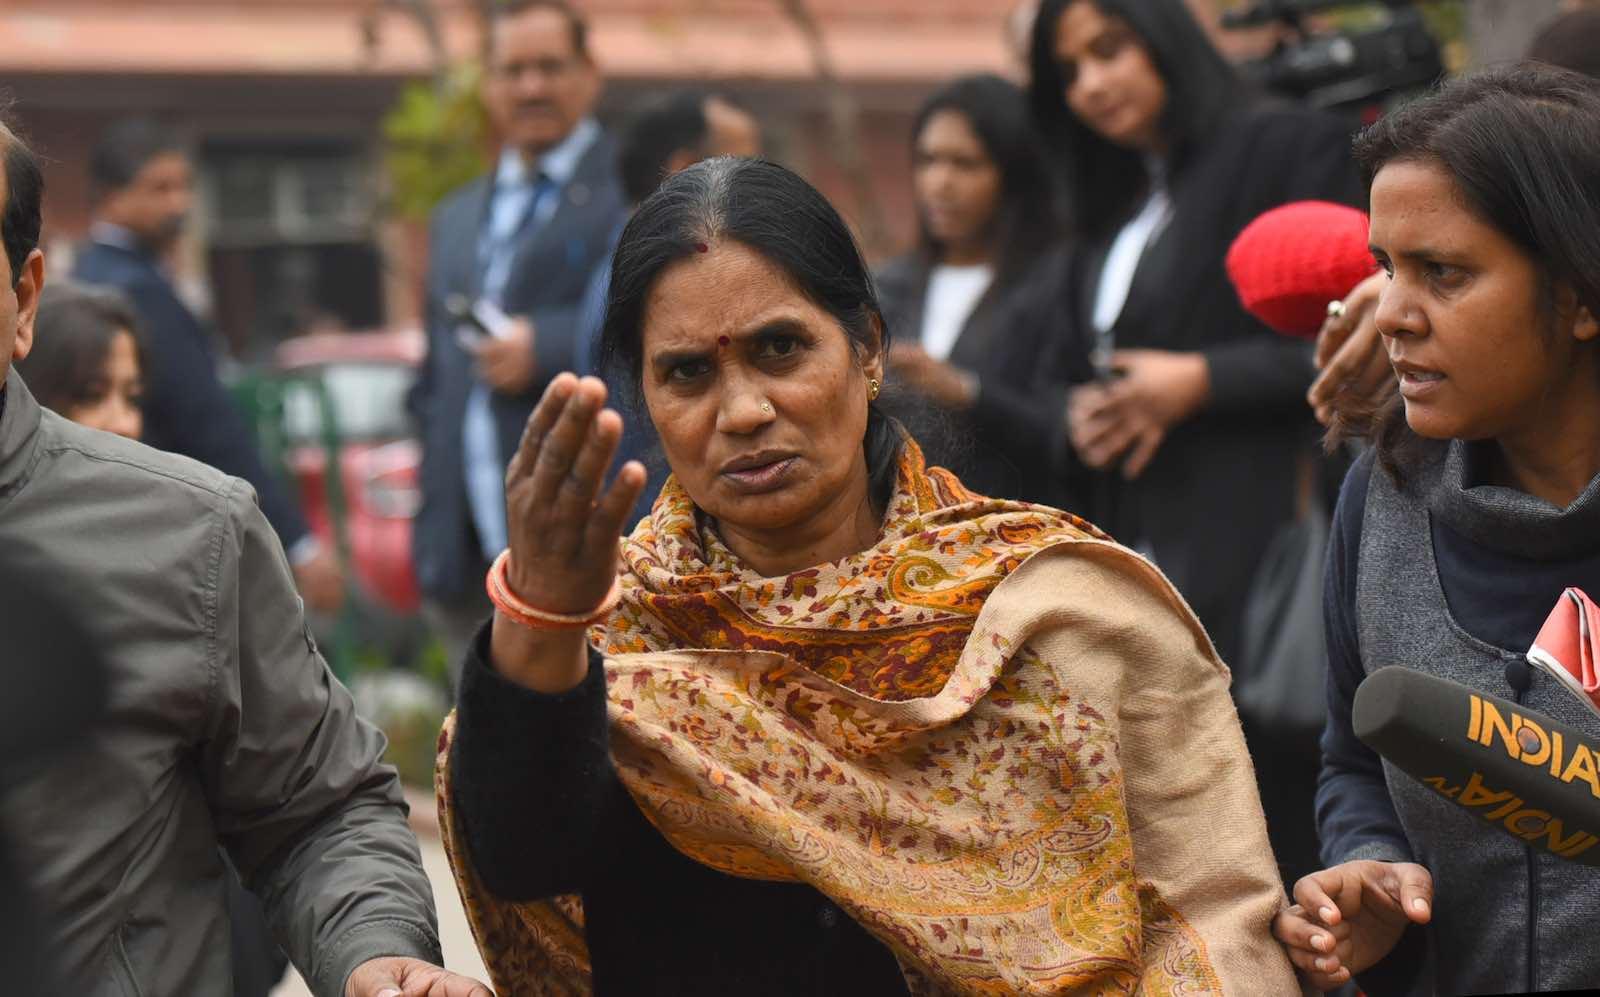 Asha Devi, mother of December 2012 gang rape victim Jyoti Singh, speaks to the media after a hearing at Supreme Court in New Delhi, 20 January (Photo: Raj K Raj/Hindustan Times via Getty)